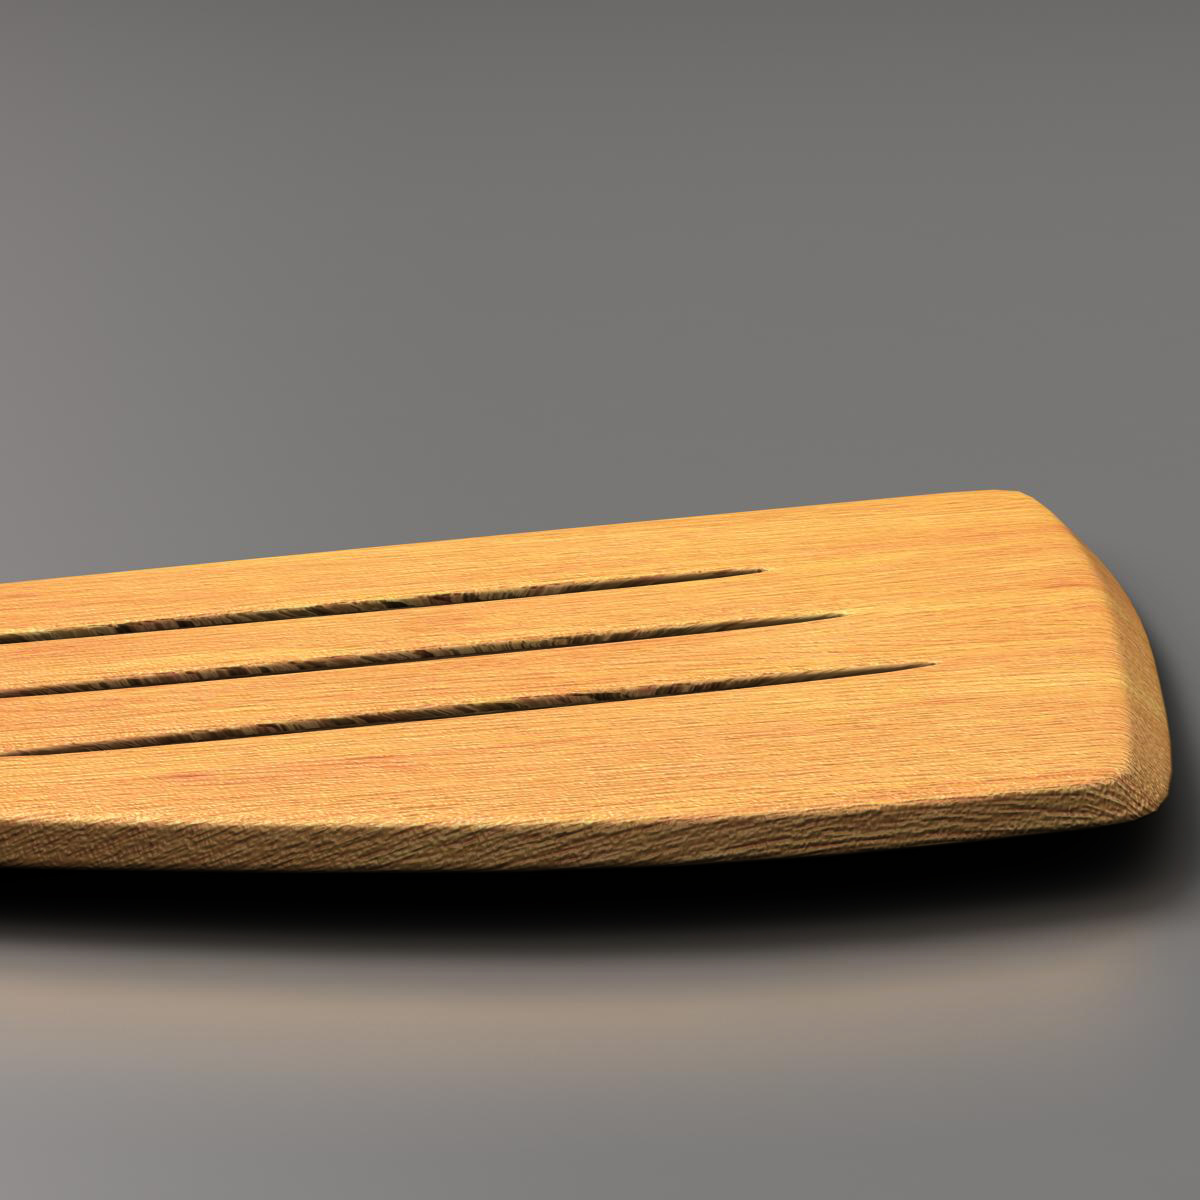 slotted spoon 3d model max fbx c4d ma mb obj 159276